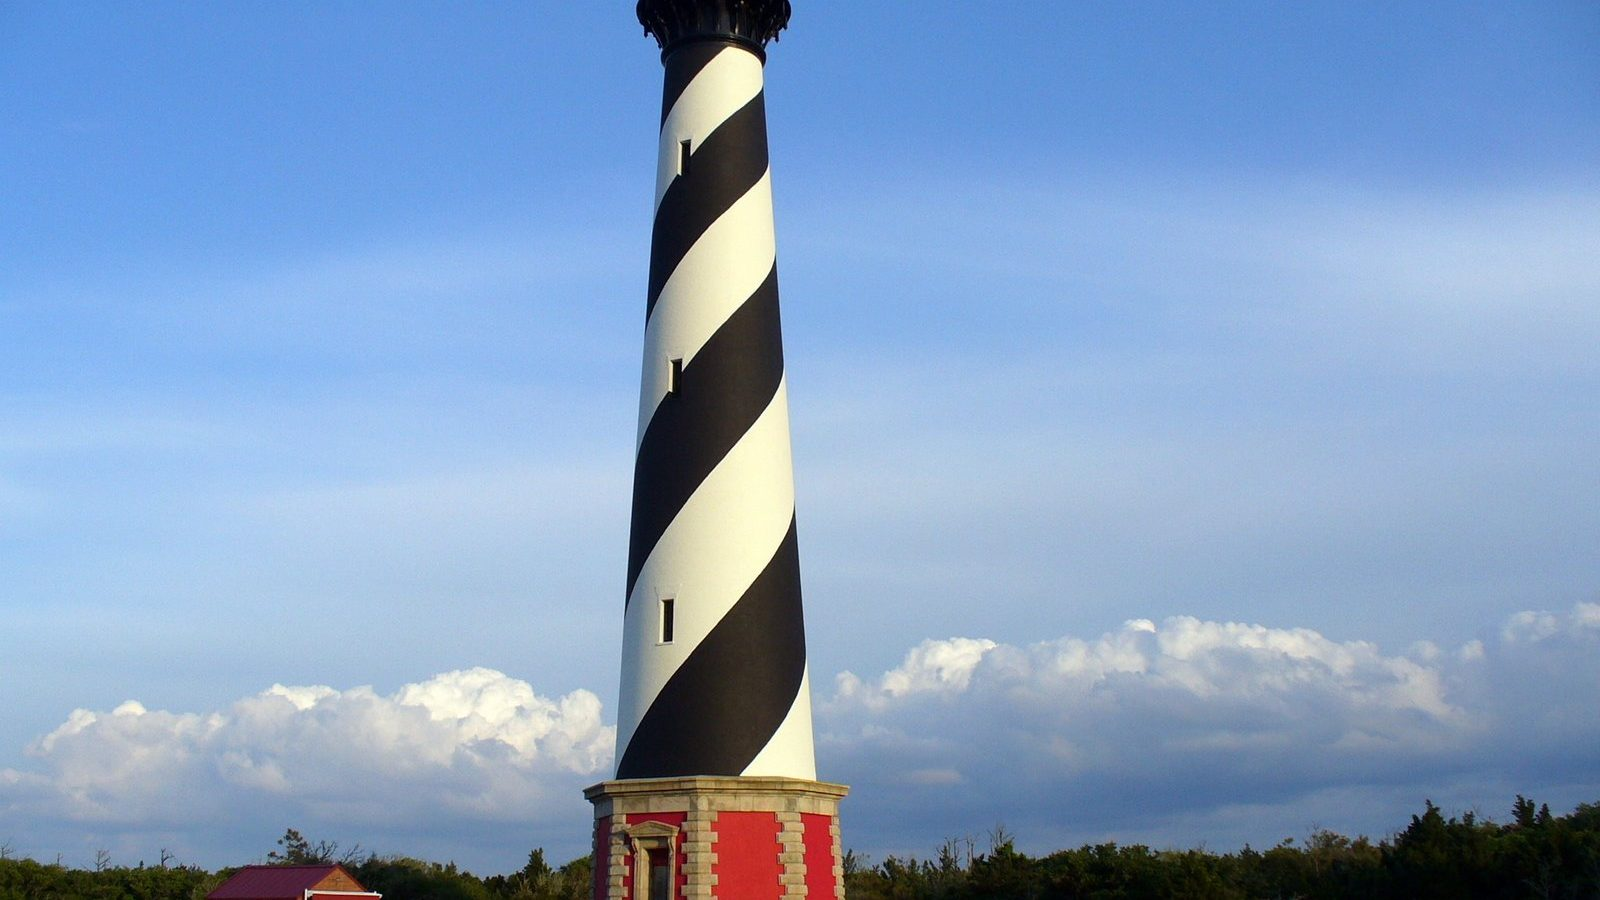 Cape Hatteras Lighthouse - Buxton